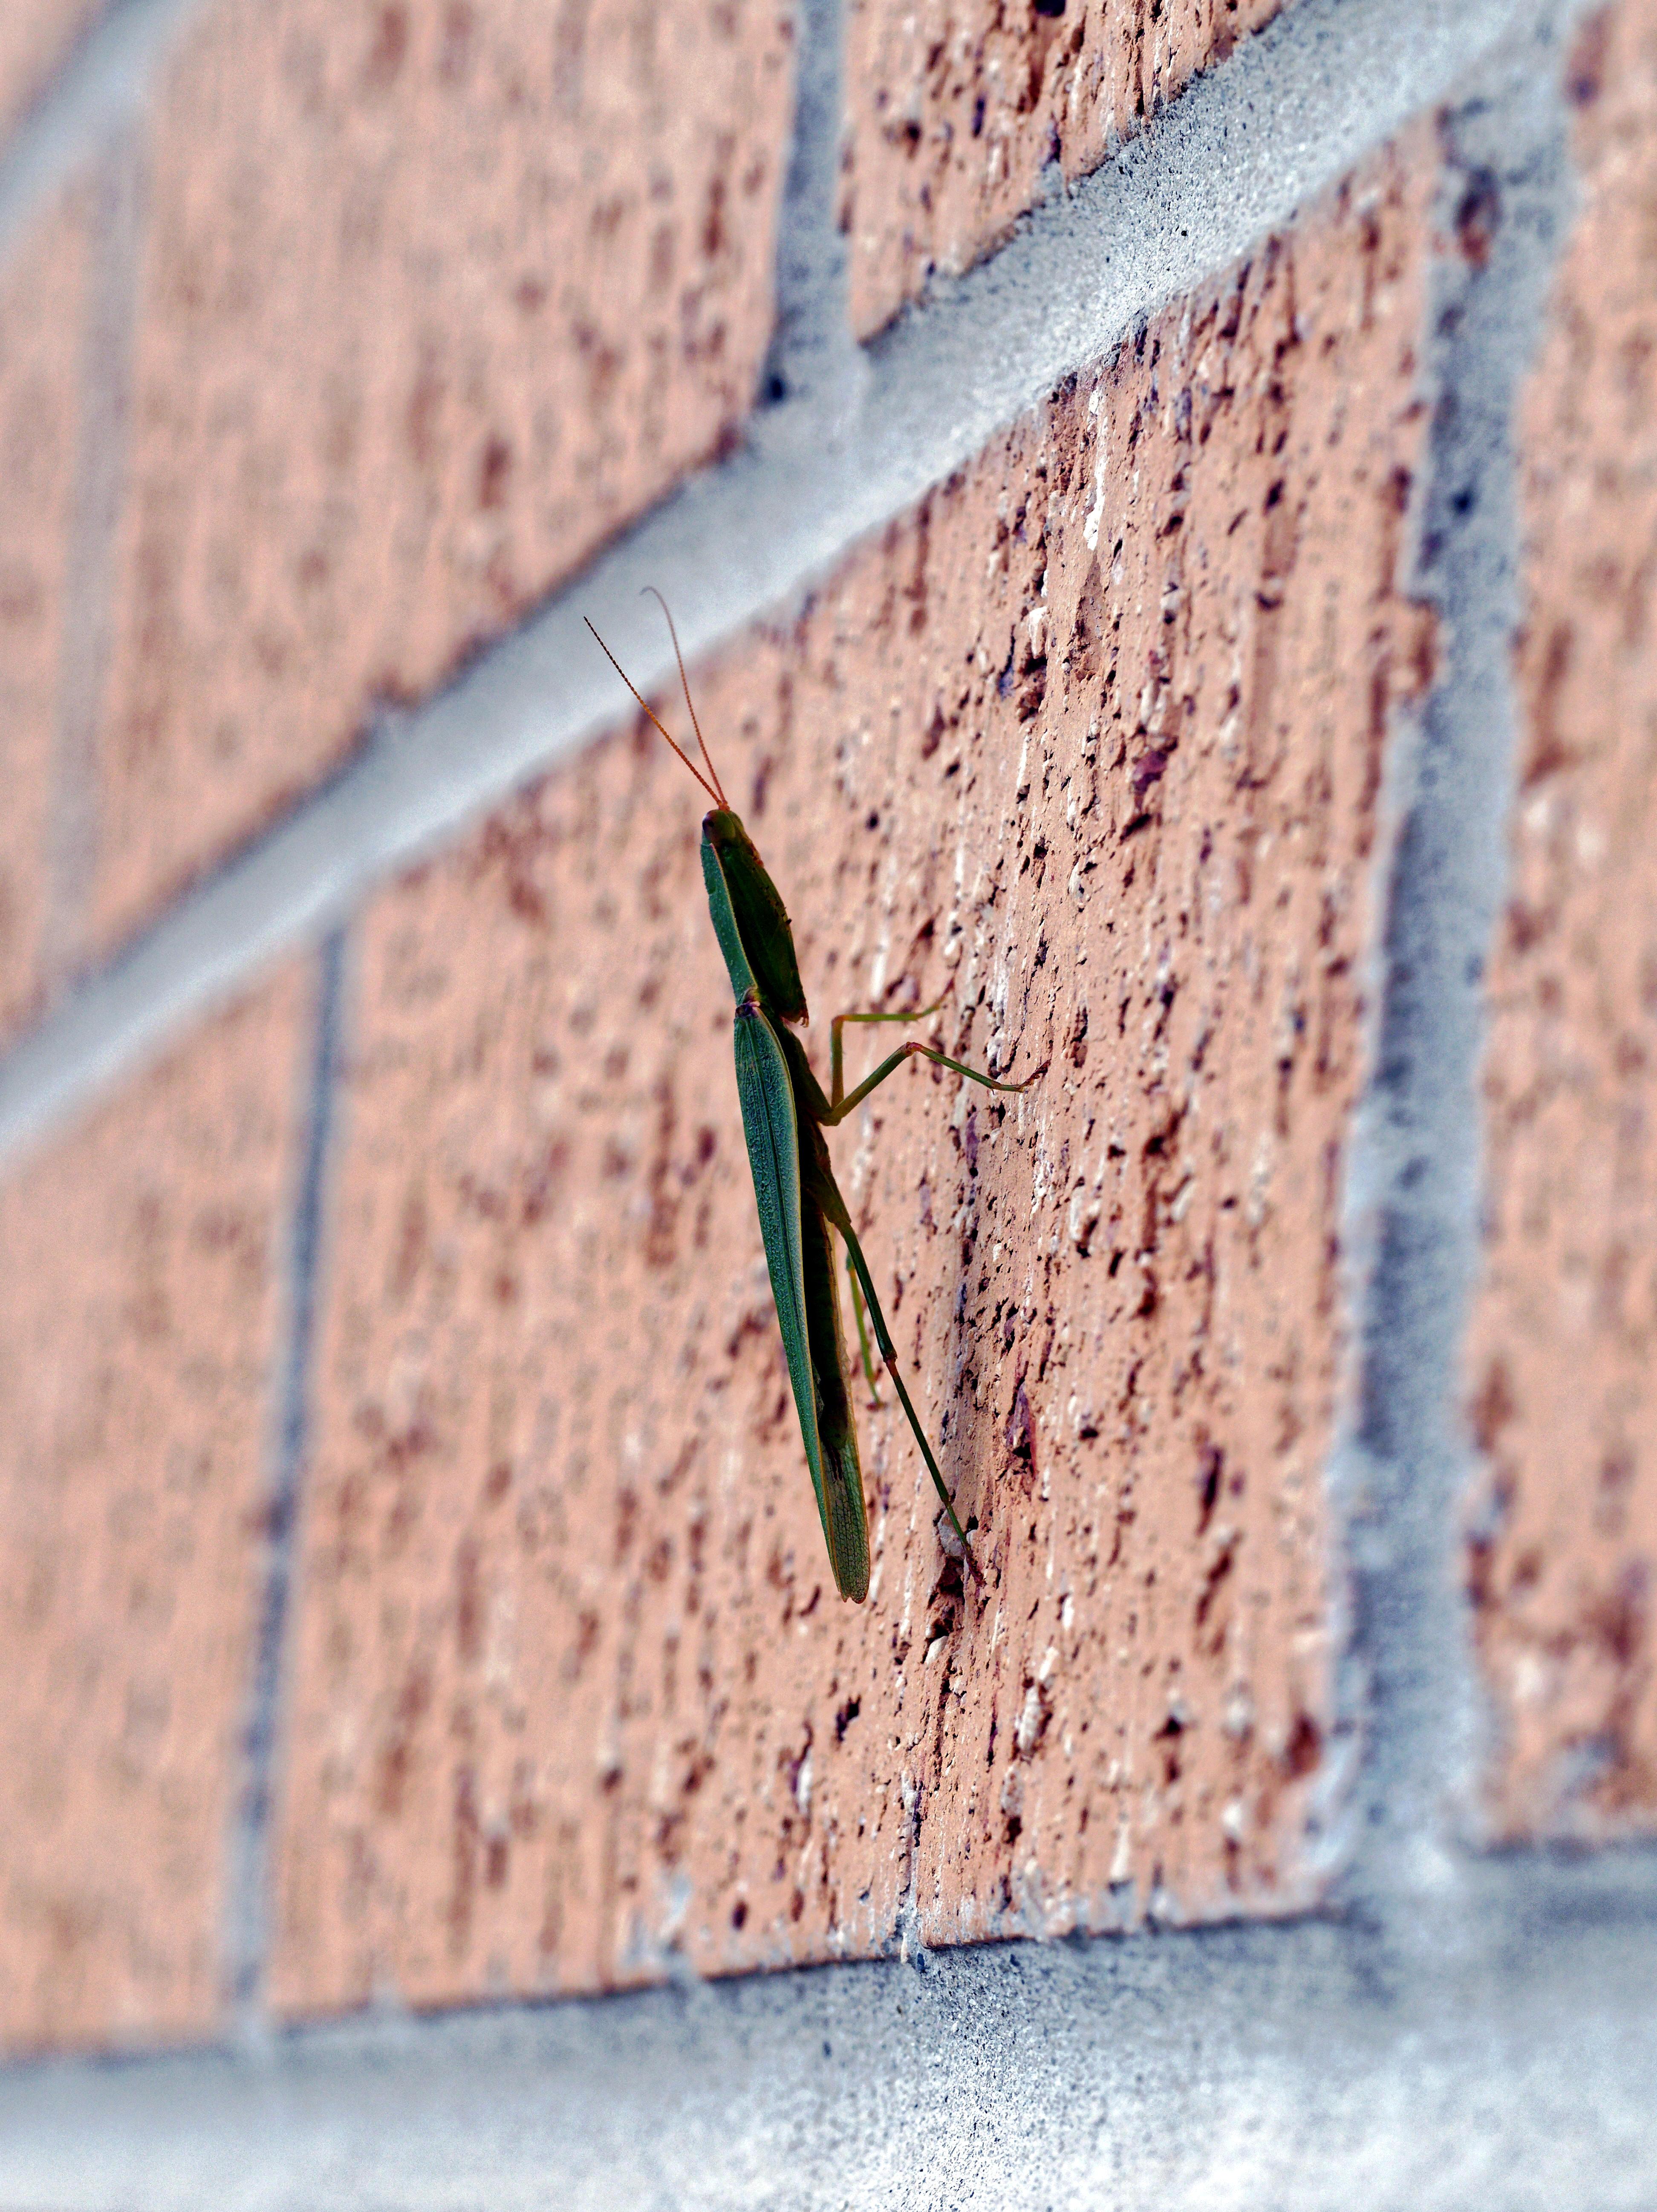 Grasshopper-3.jpeg